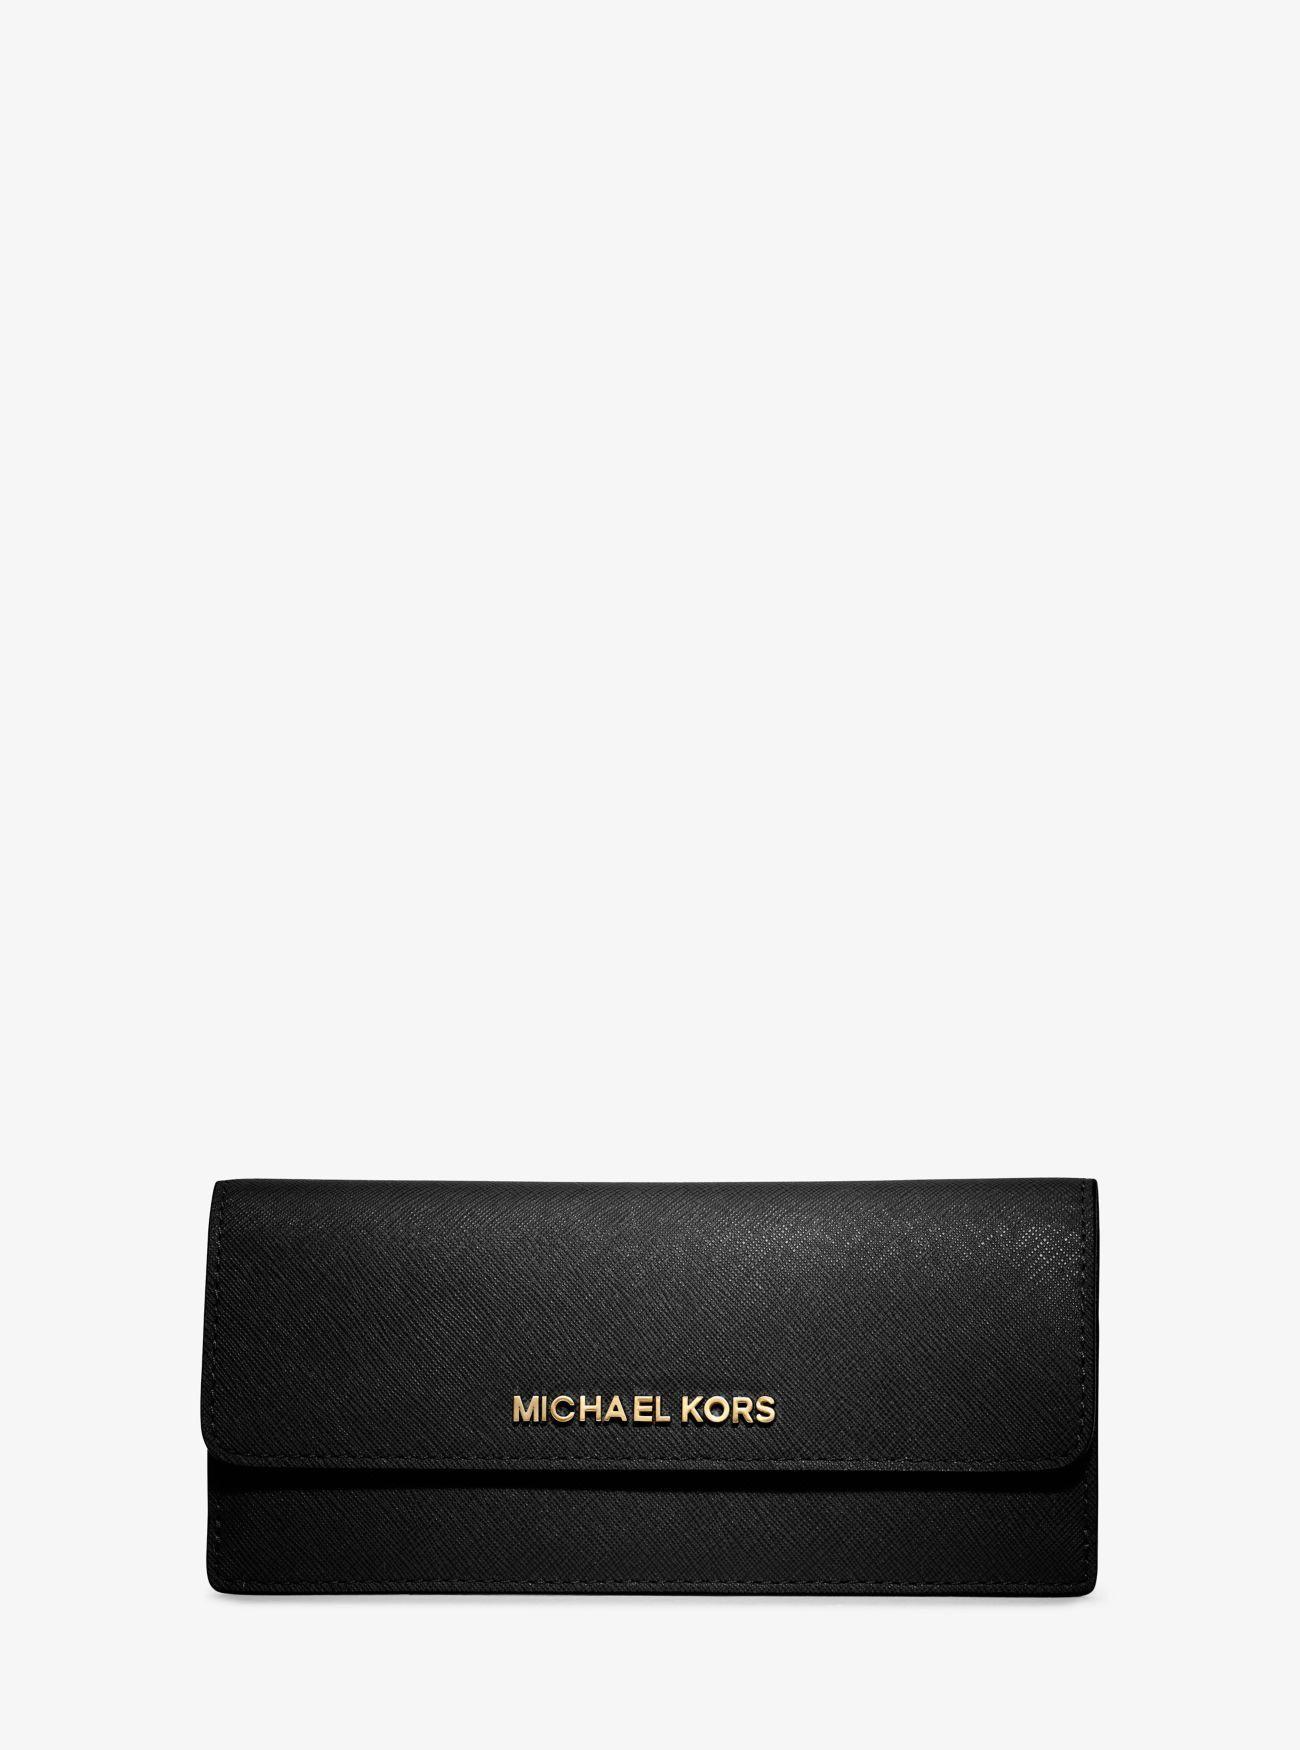 6f7a18824b02 MICHAEL KORS Jet Set Travel Slim Saffiano Leather Wallet. #michaelkors #